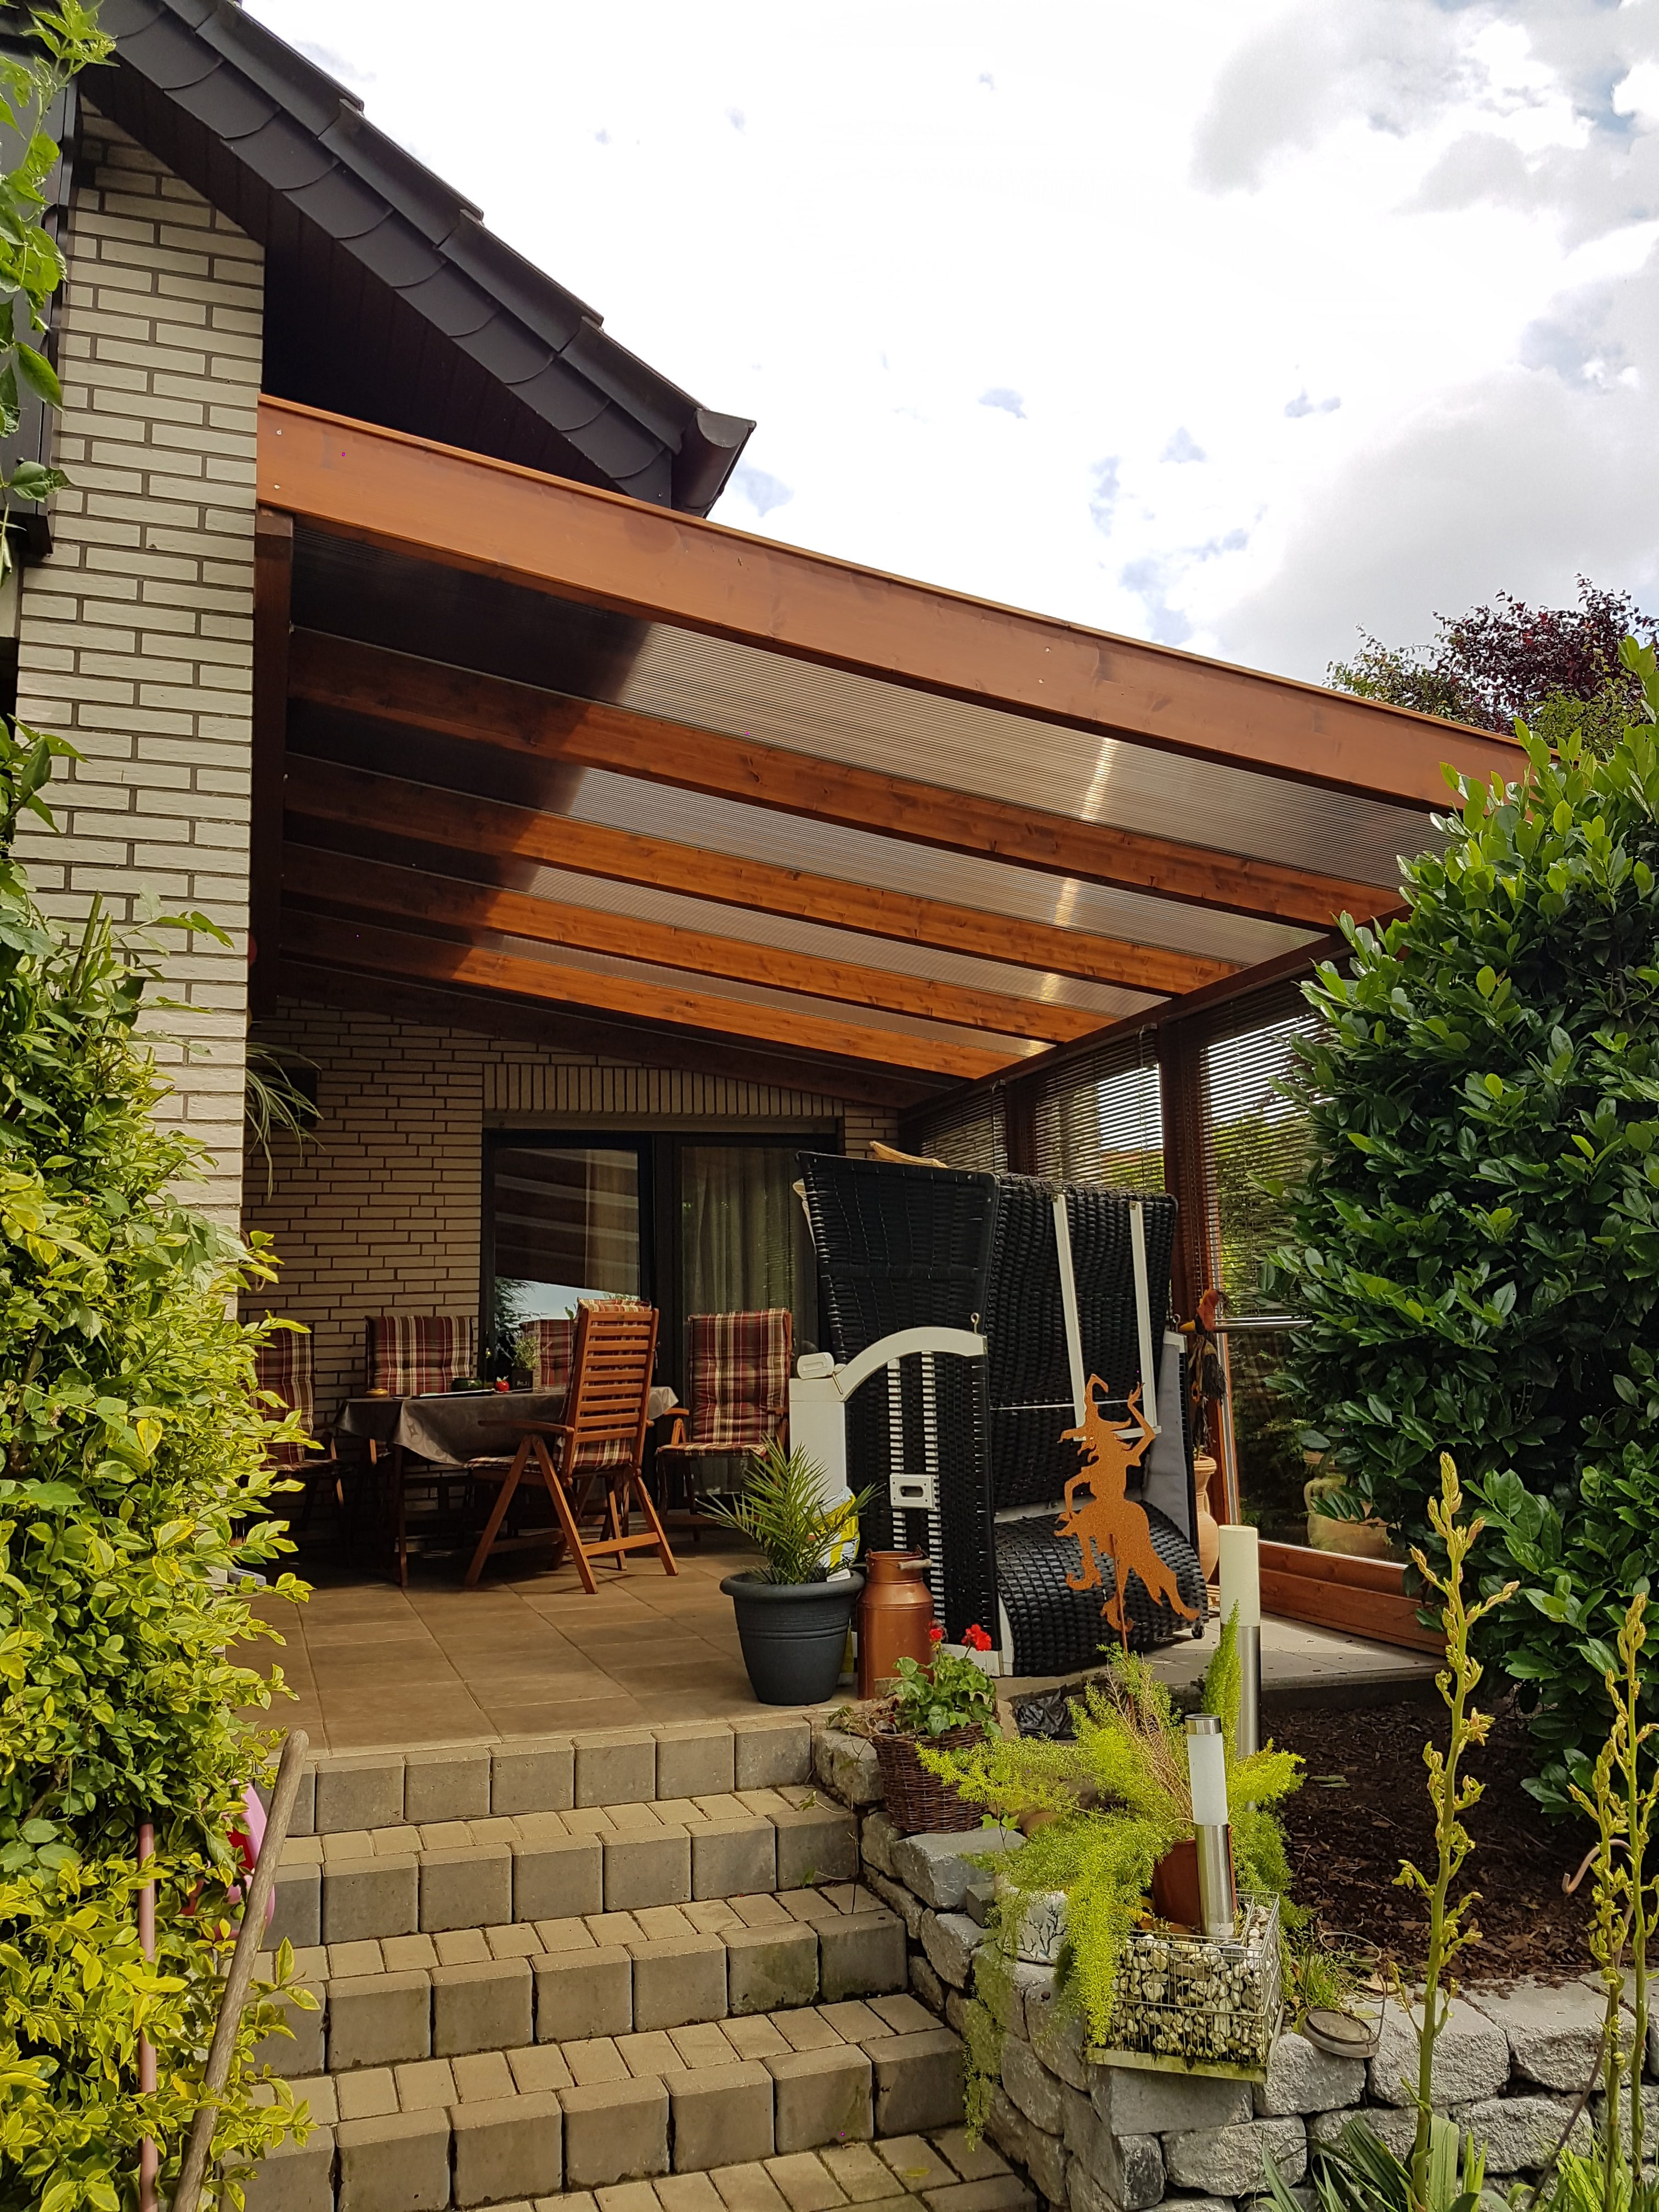 Terrassenüberdachung, Holz, braun, Verbundglas